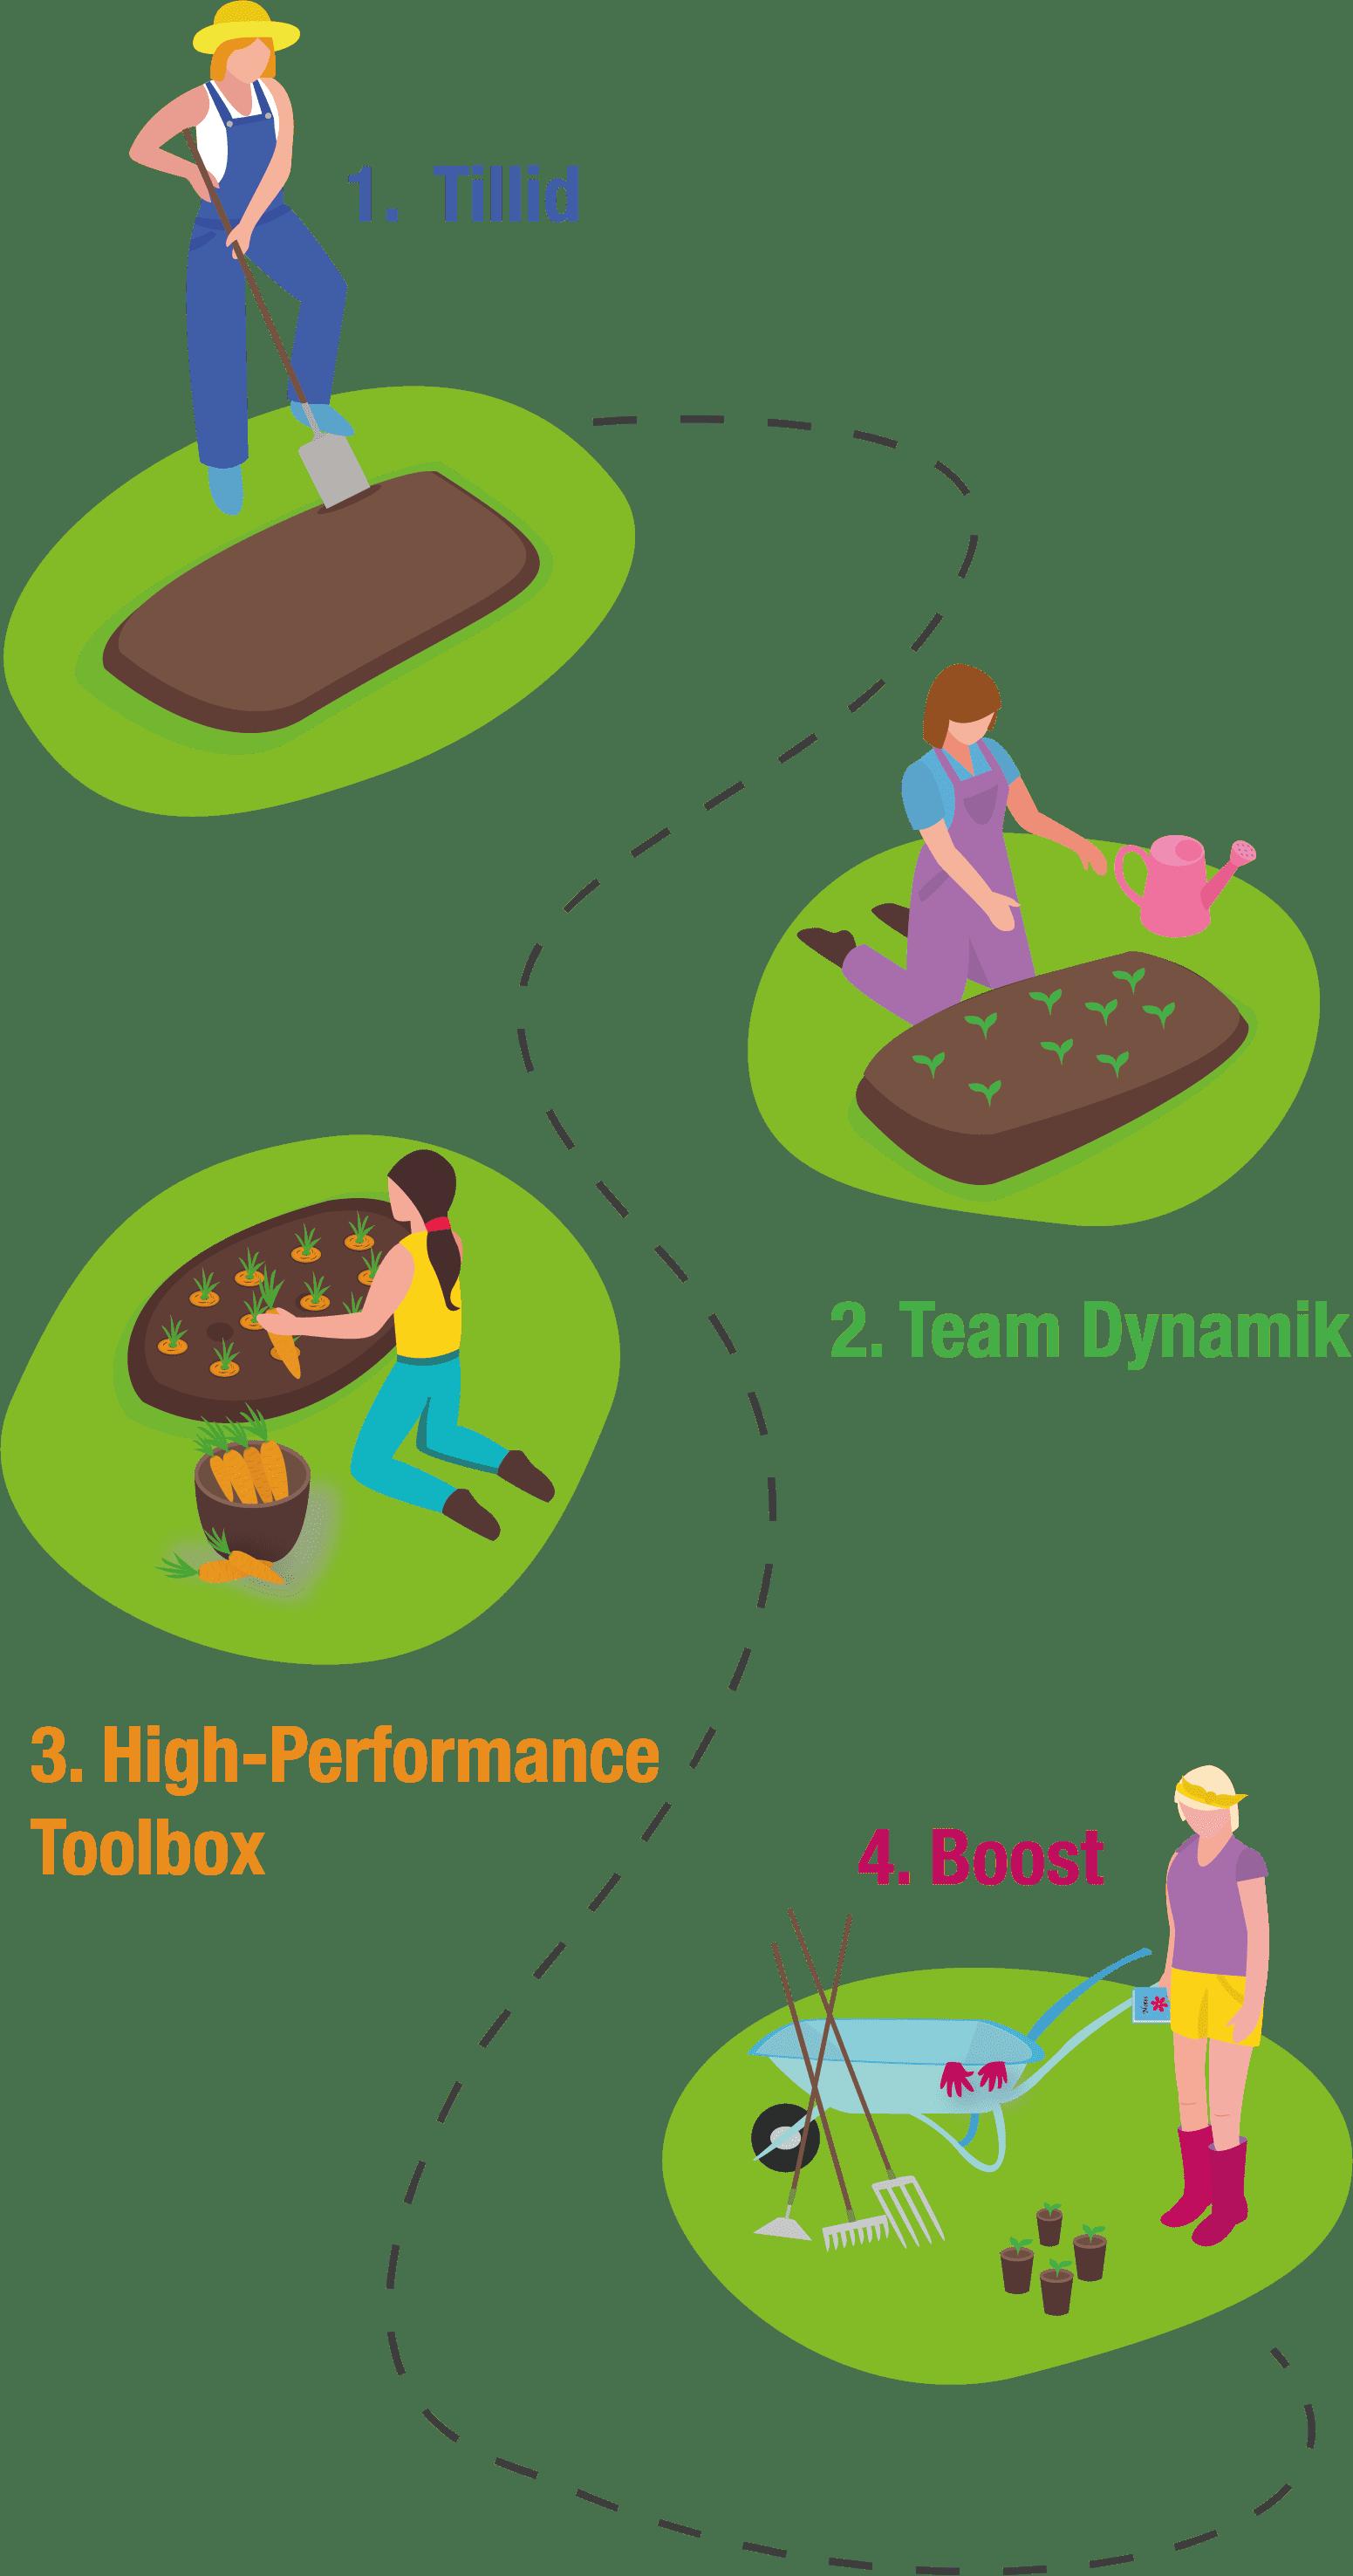 BHPT illustration mobilversion